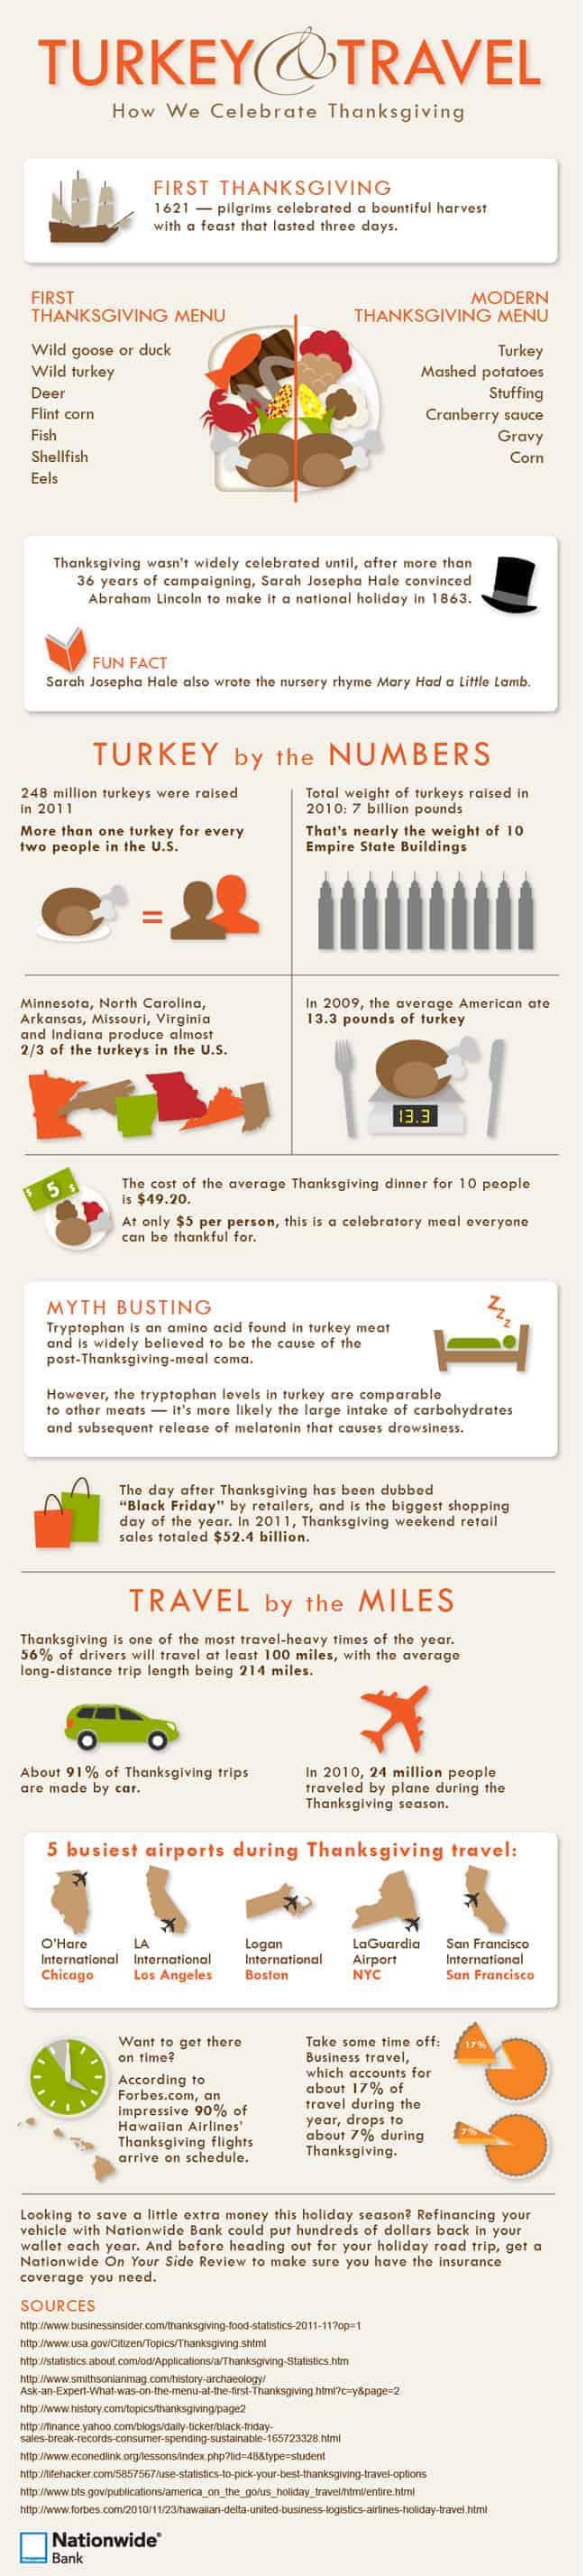 Turkey & Travel How We Celebrate Thanksgiving